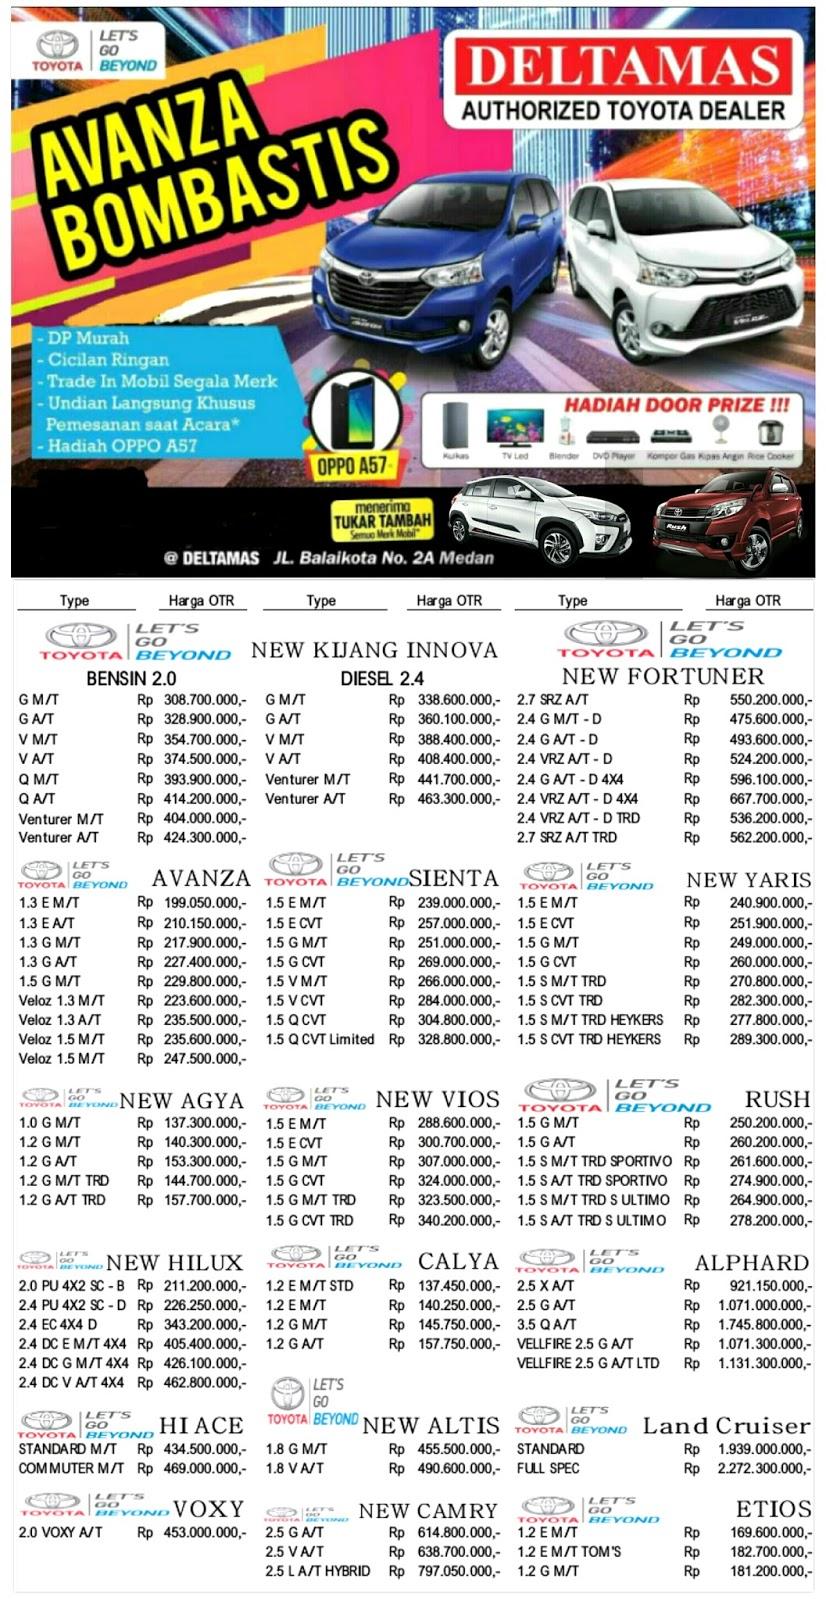 Toyota Deltamas Medan Booking Fee New Agya Trd A T Giias 2018 Pesta Akhir Tahun Deltmas